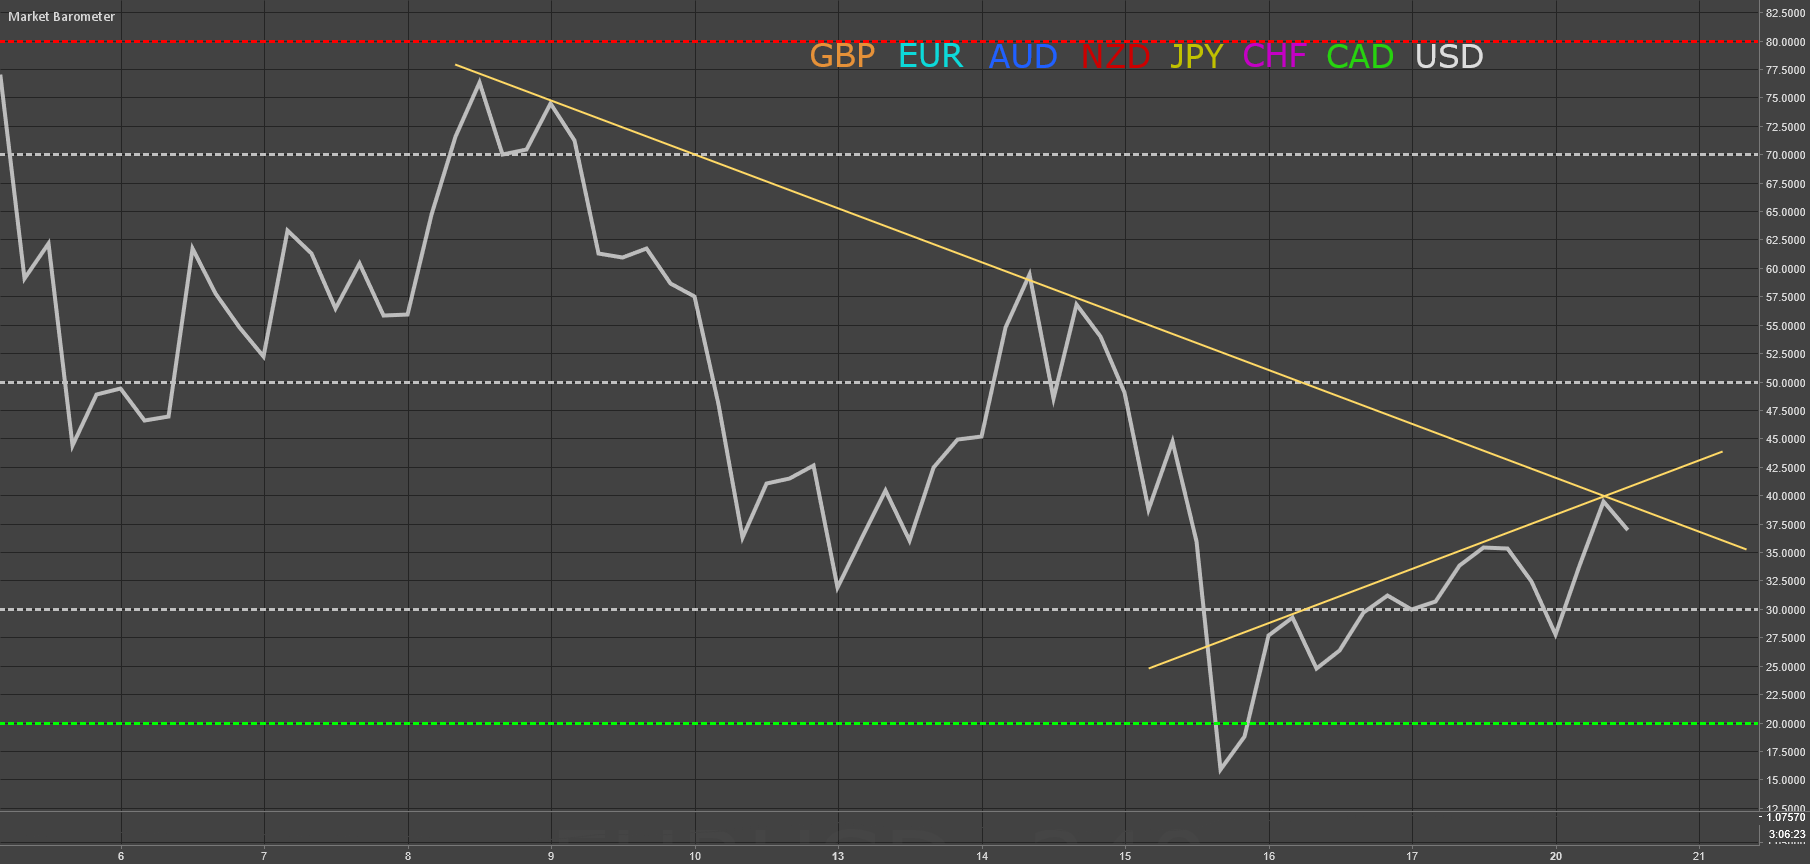 USD - Market Barometer Update